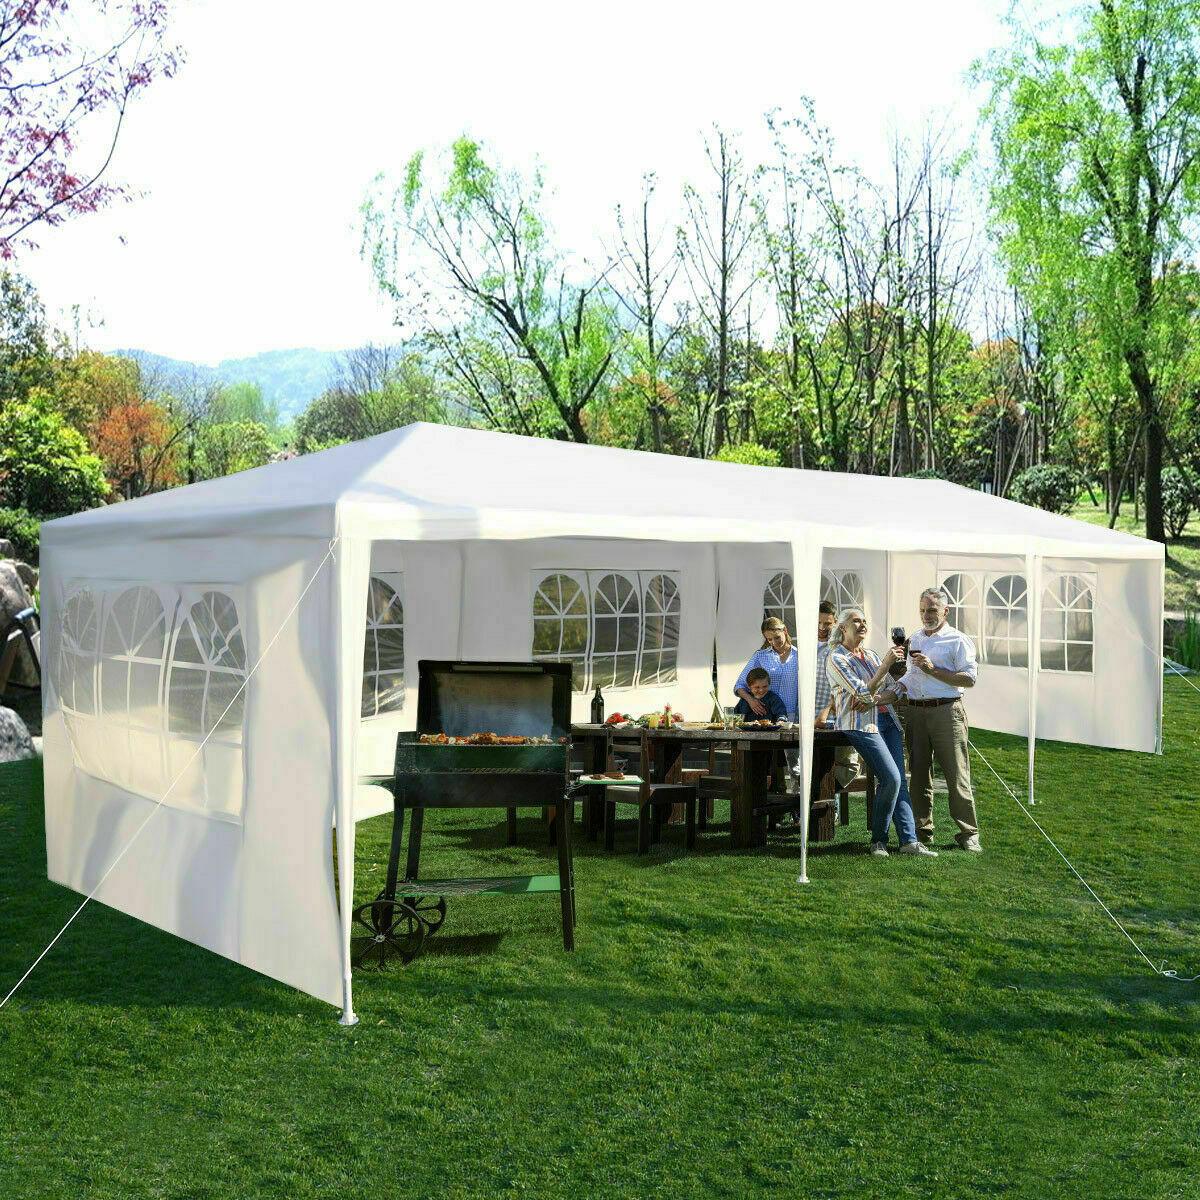 10'x30' Party Wedding Outdoor Patio Tent Canopy Heavy duty G